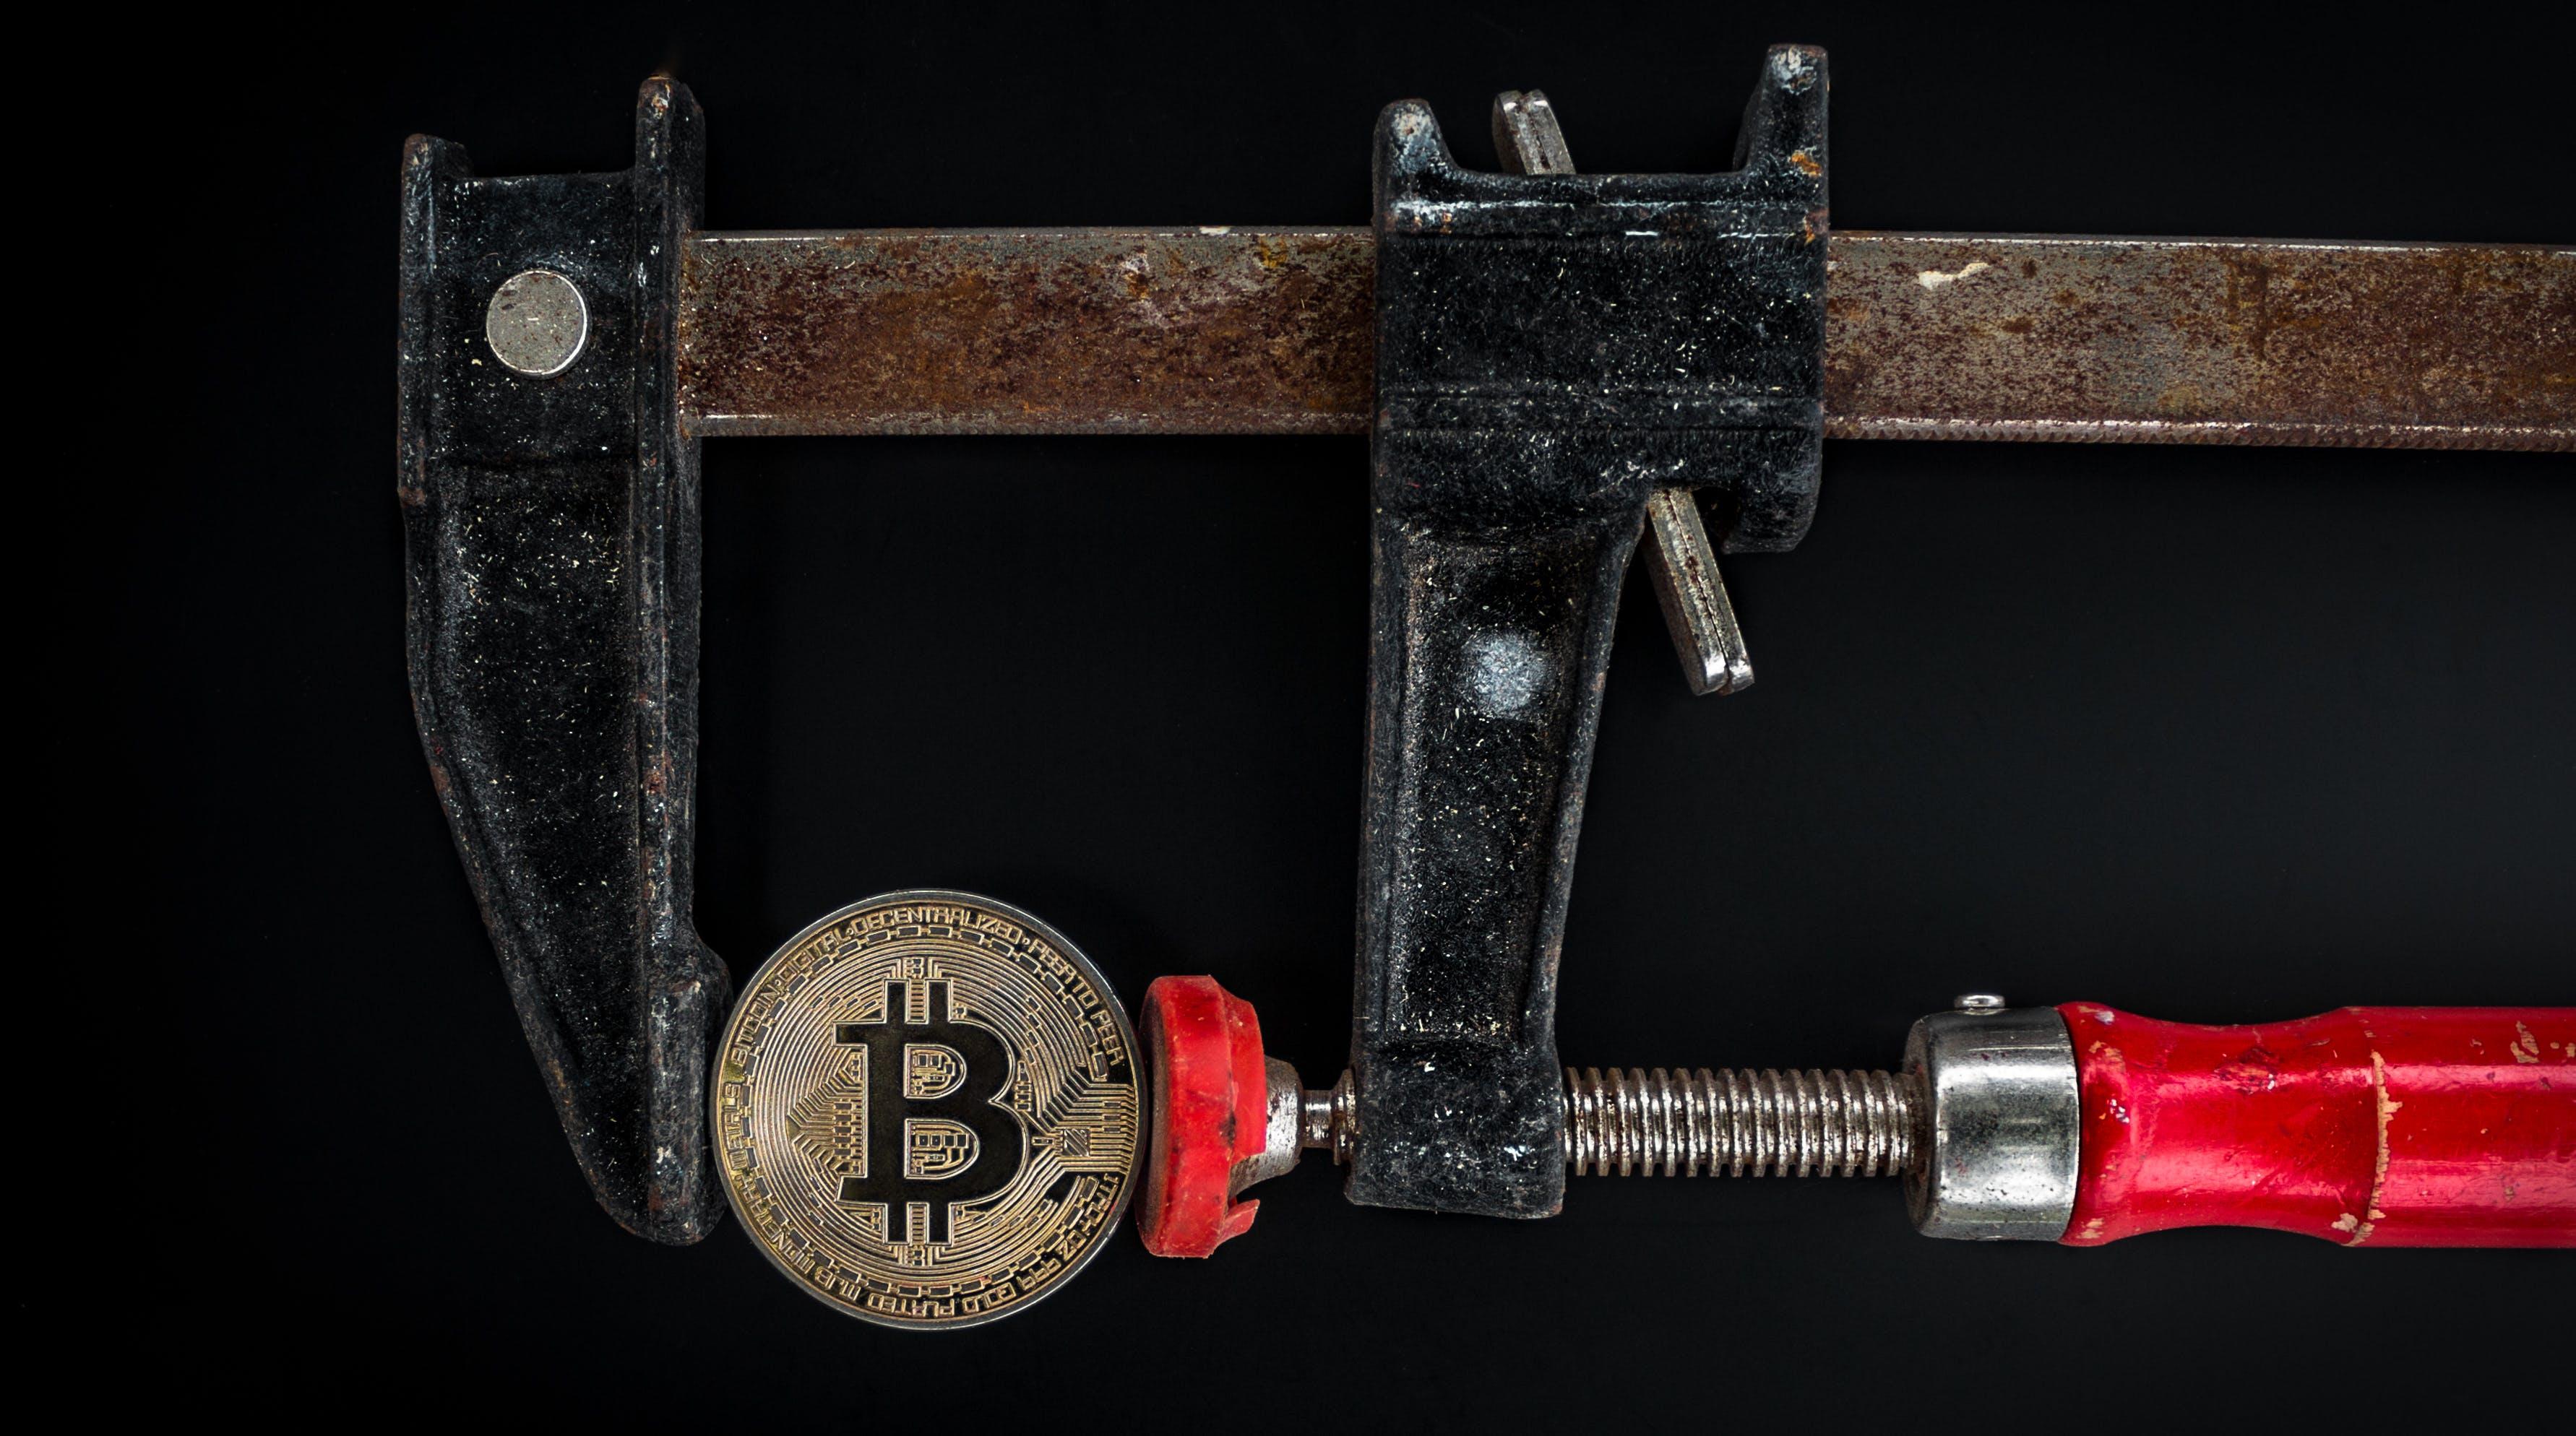 Gratis arkivbilde med bitcoin, blokkjede, jern, kryptovaluta